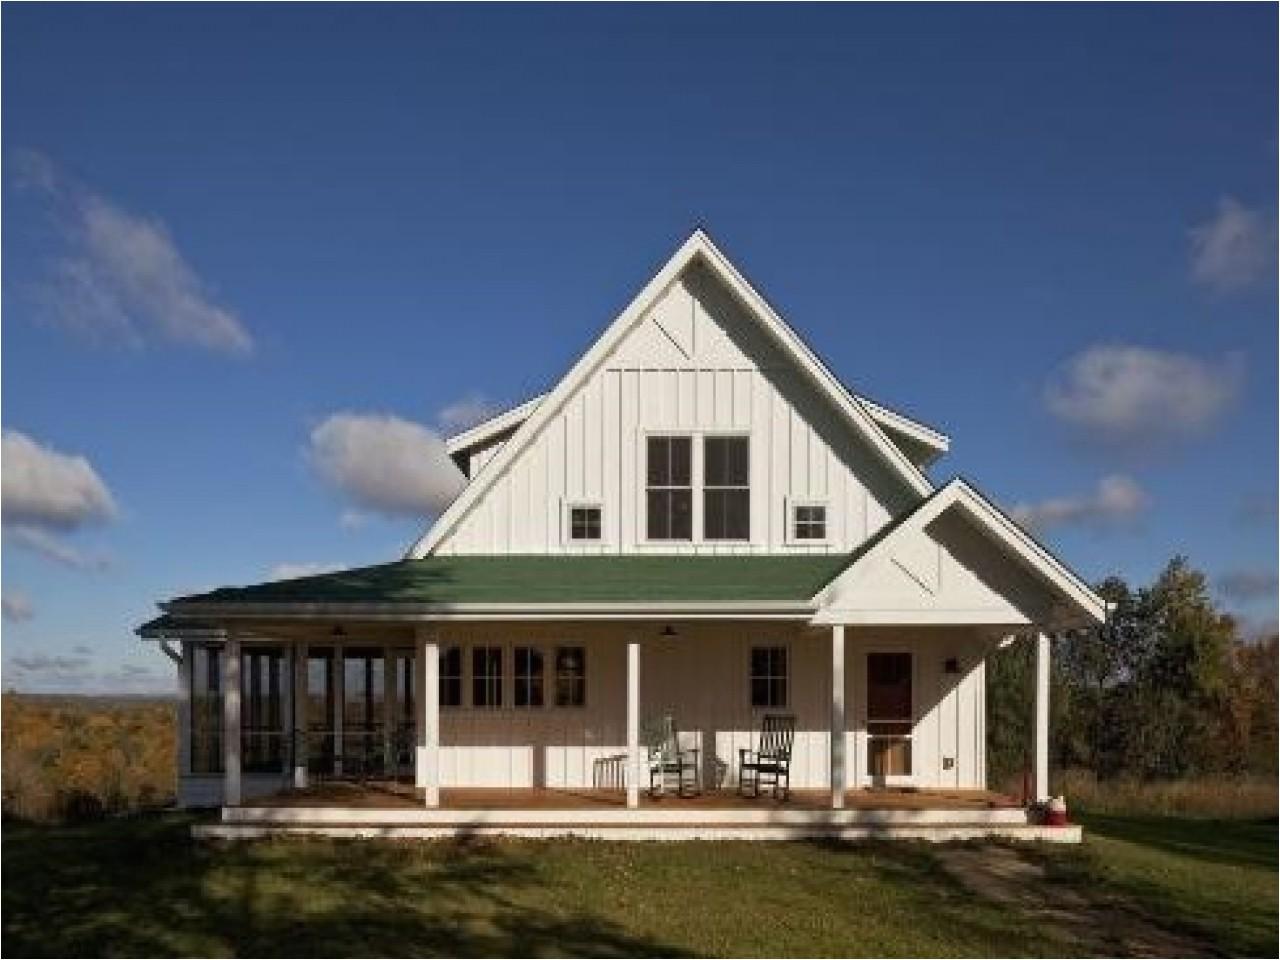 4f5cee87d1fa1dd8 single story farmhouse with wrap around porch one story farmhouse house plans